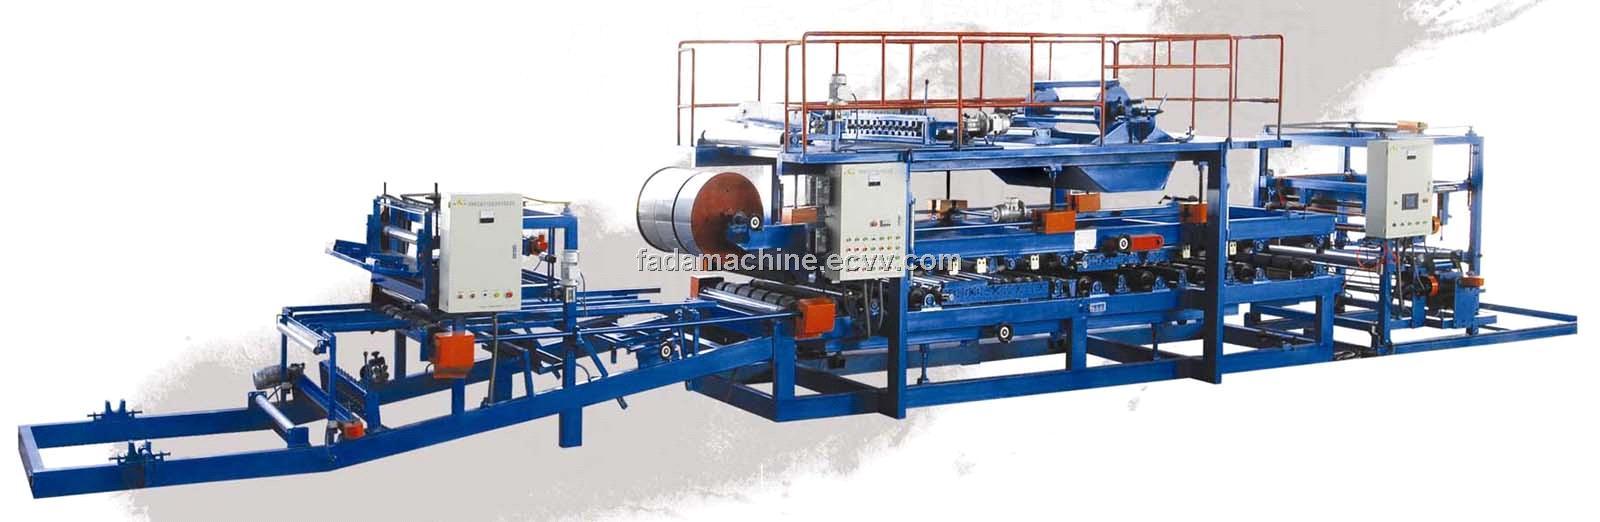 Eps Sandwich Panel Machine : Eps composite sandwich panel forming machine purchasing